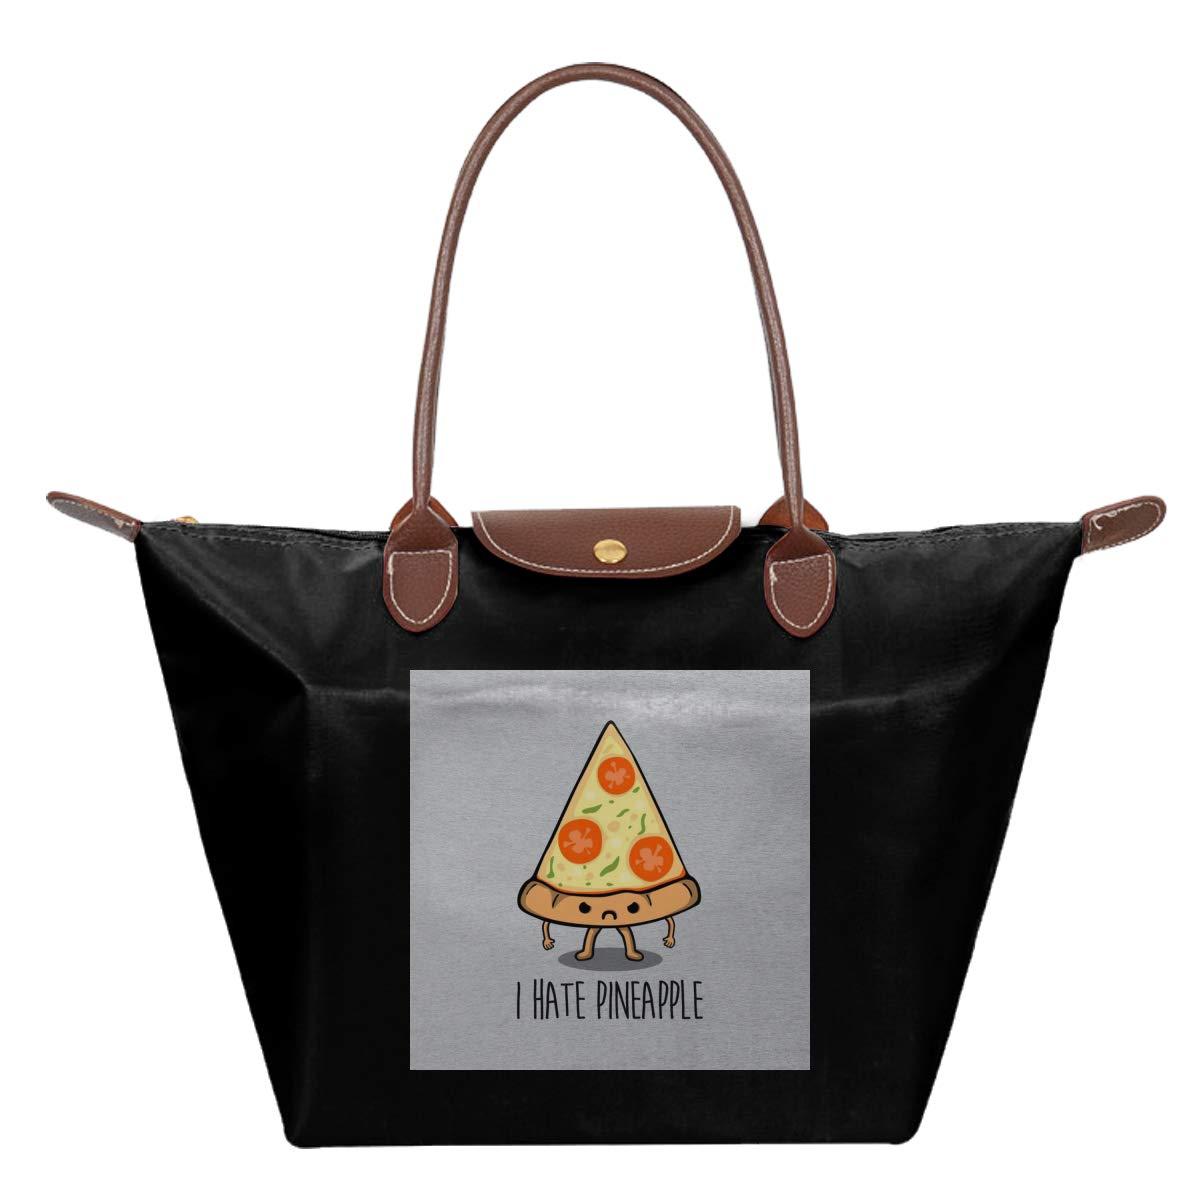 I Hate Pineapple Pepperoni Pizza Waterproof Leather Folded Messenger Nylon Bag Travel Tote Hopping Folding School Handbags